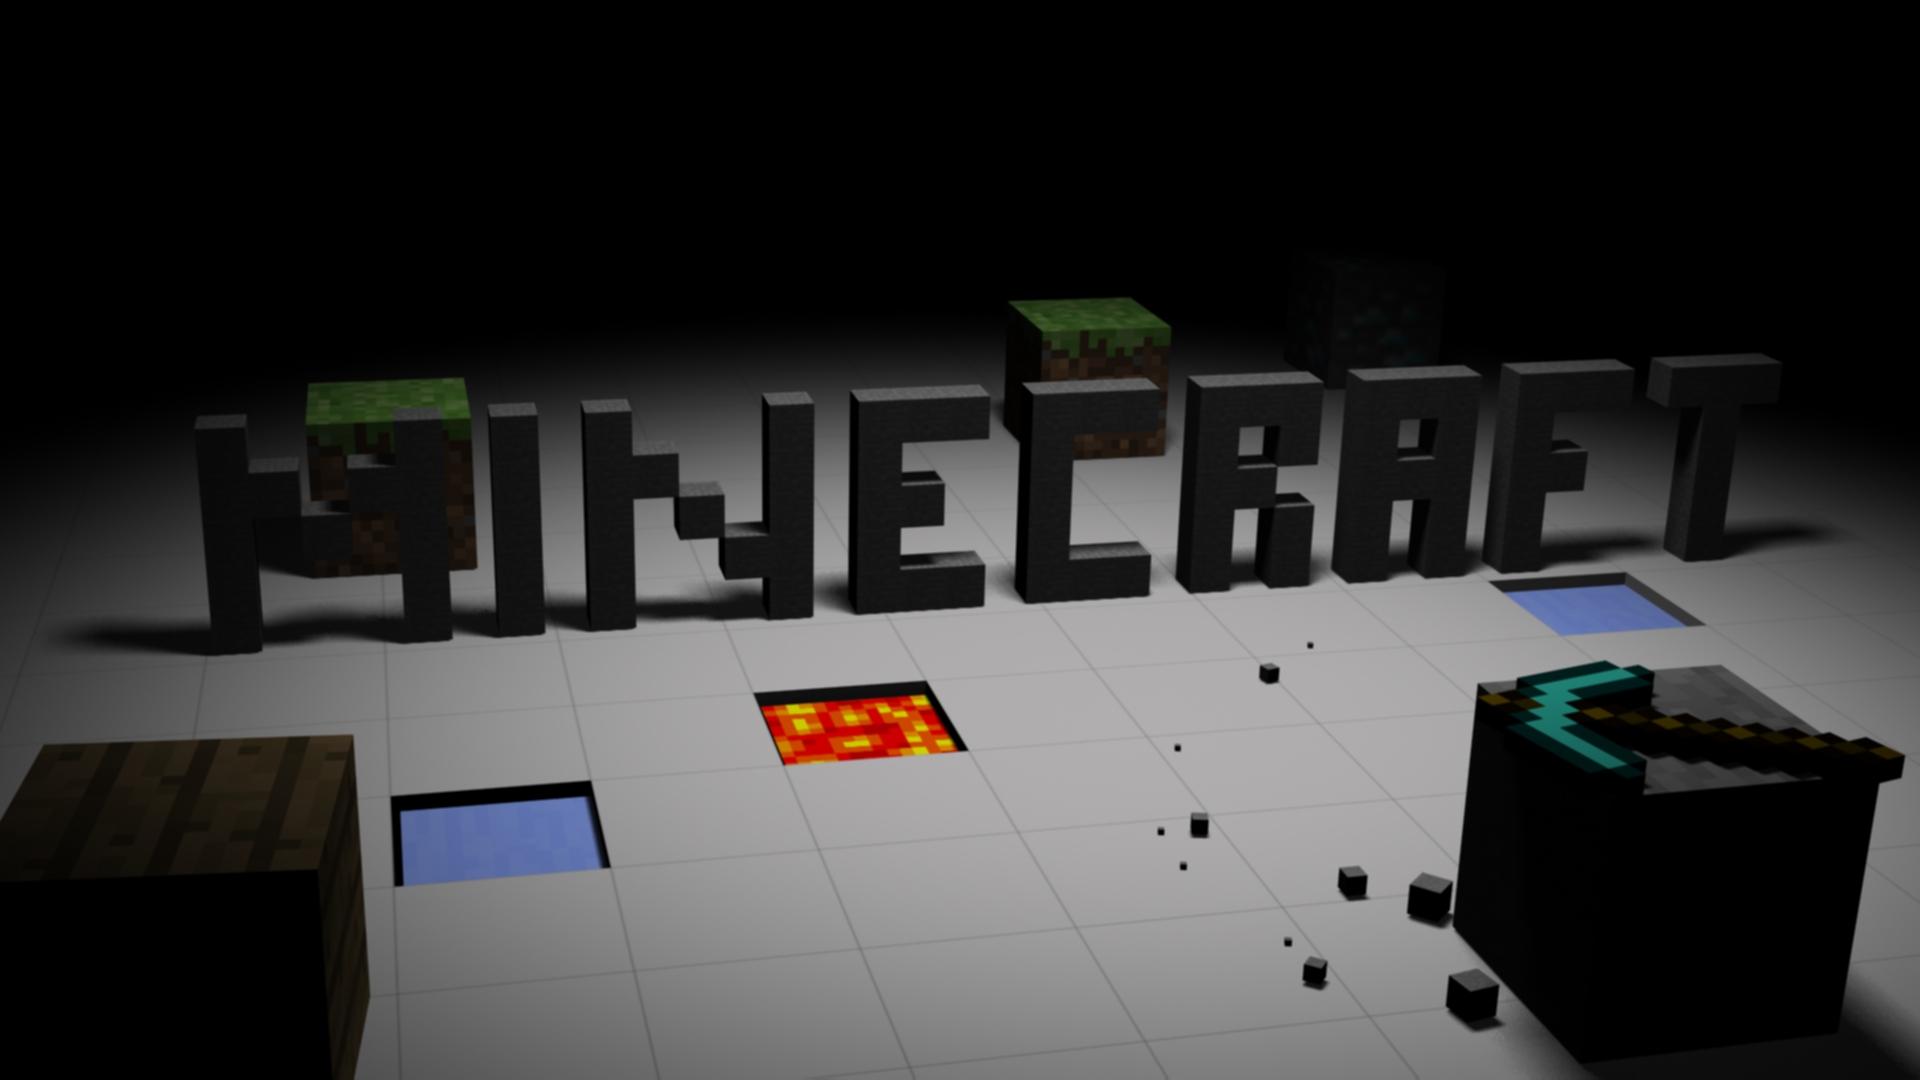 Cool Wallpaper Minecraft Gamer - minecraft-wallpaper-16  Image_486535.jpg